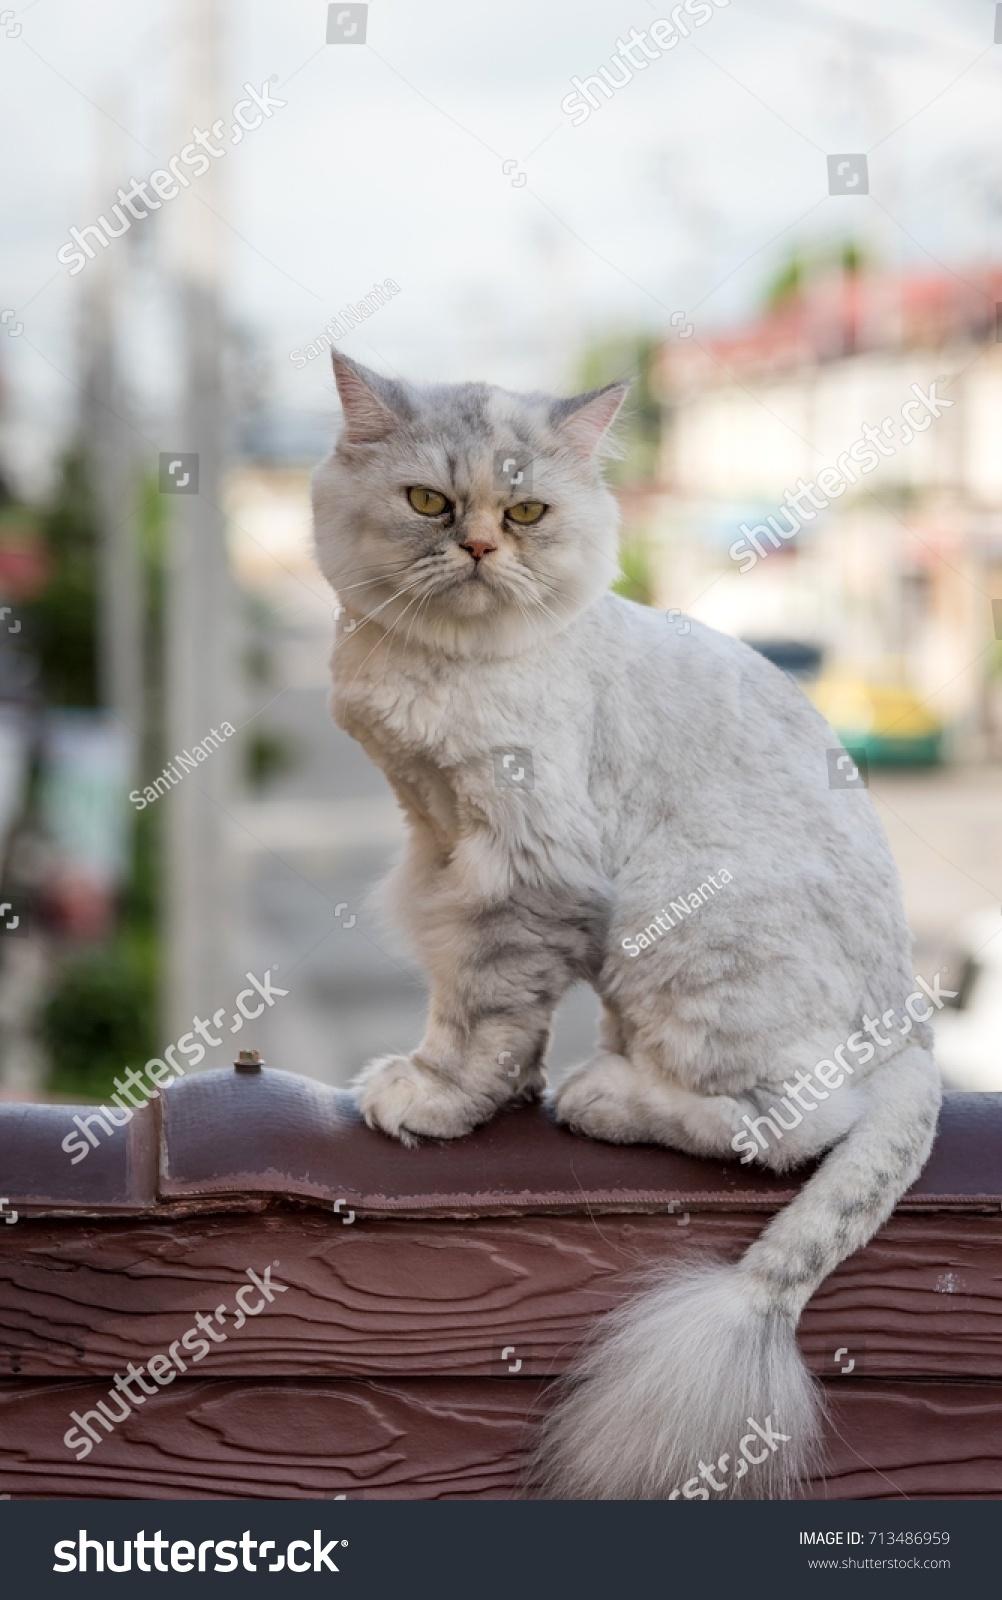 Persian Cat Haircut Like Lion Stock Photo Edit Now 713486959